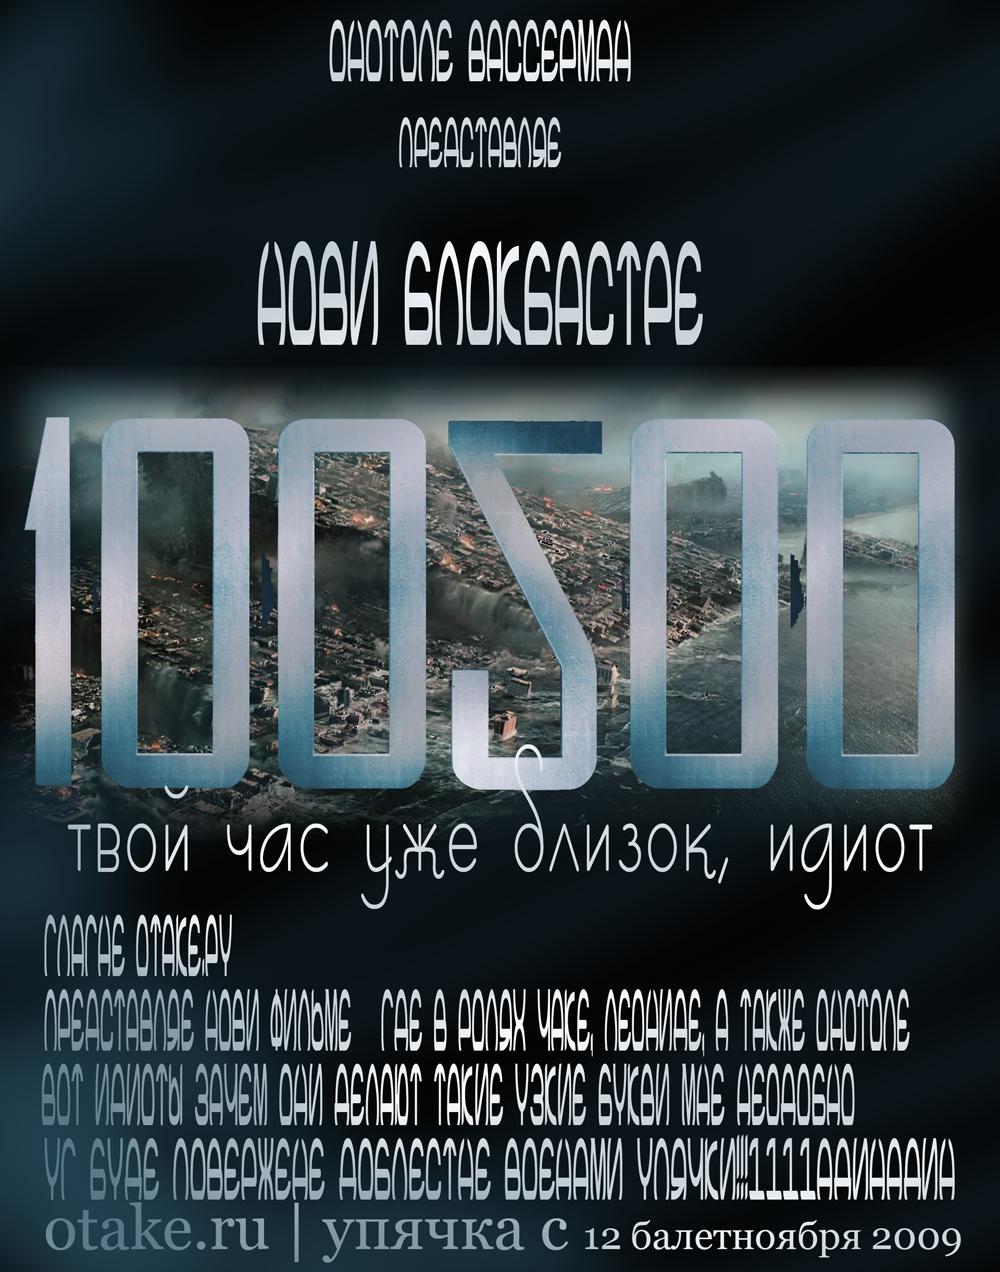 http://obojdi.ucoz.ru/pictures/moe/afisha2.png